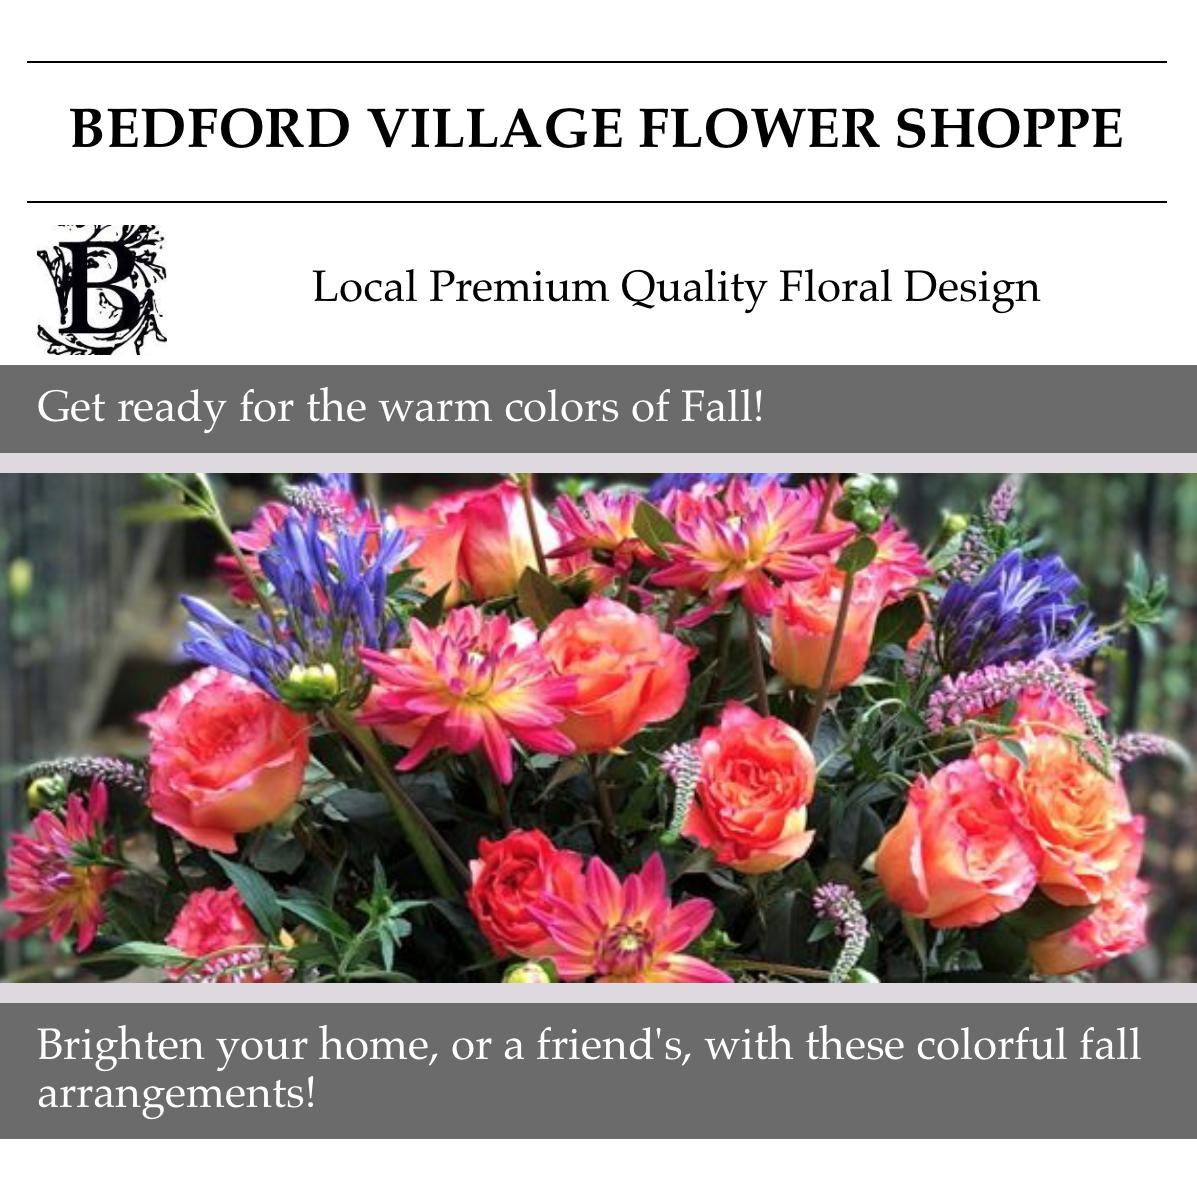 "<a href=""https://conta.cc/2DajL44"" target=""_blank"">Bedford Village Flower Shop</a>"